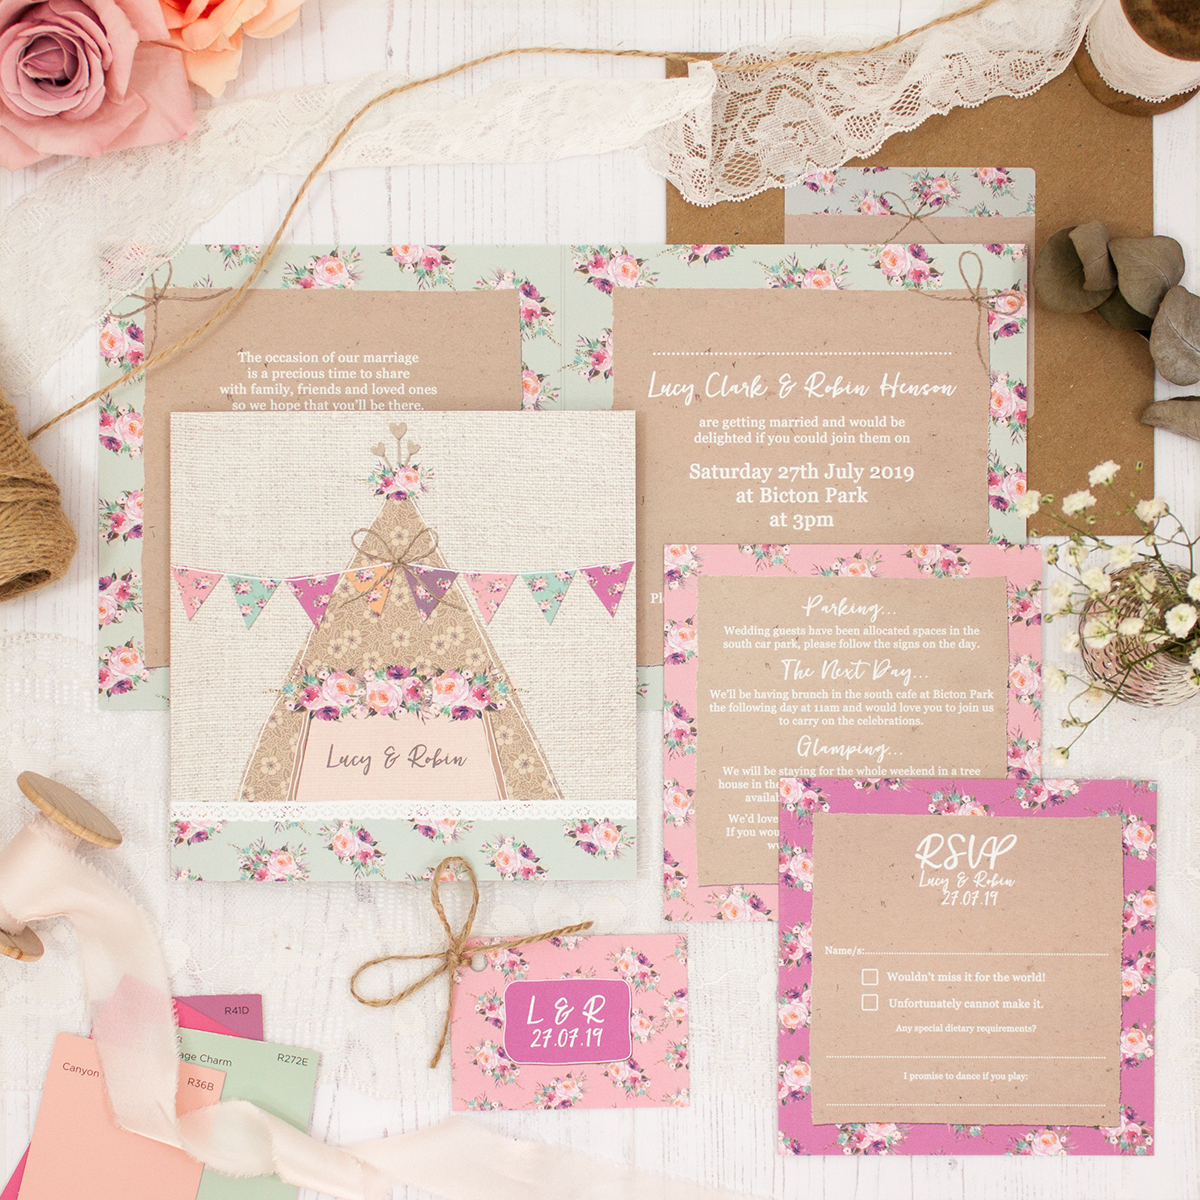 Tipi Love Wedding showing invitation